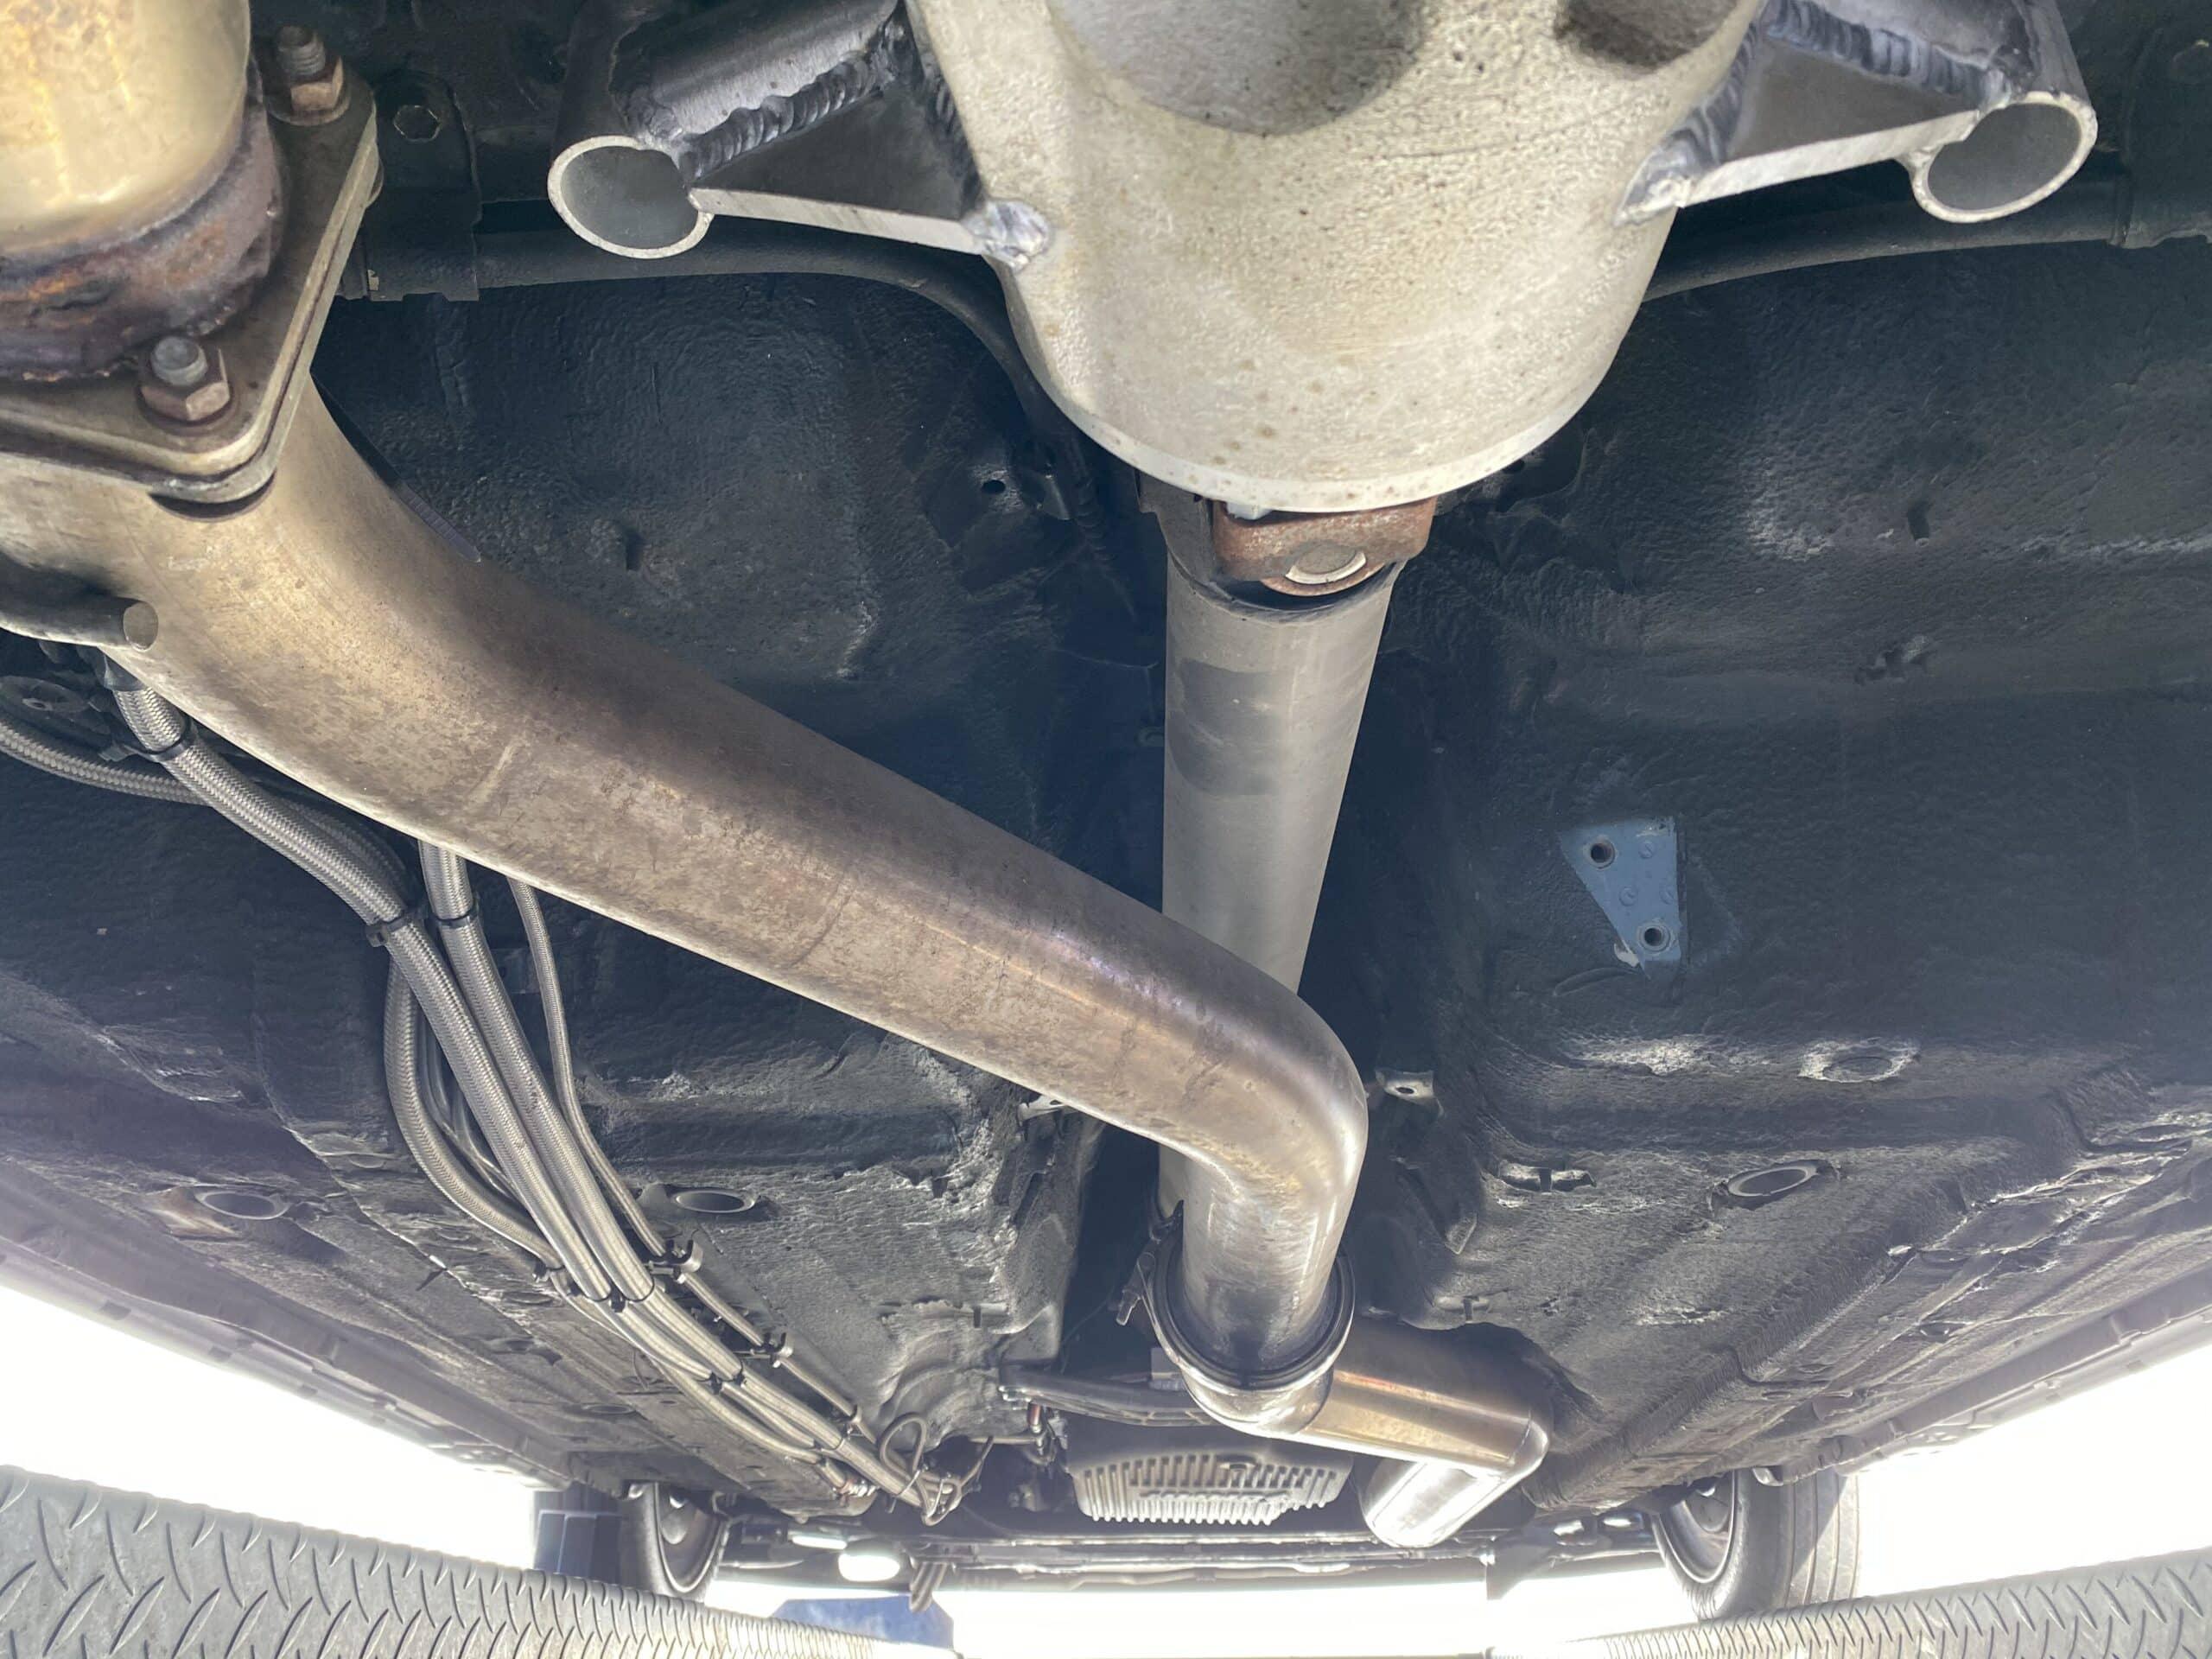 1994 Toyota Supra Big Turbo MK IV Boost logic Built motor – TH 400 trans 1276 WHP Street Car – Pro EFI – Cold AC